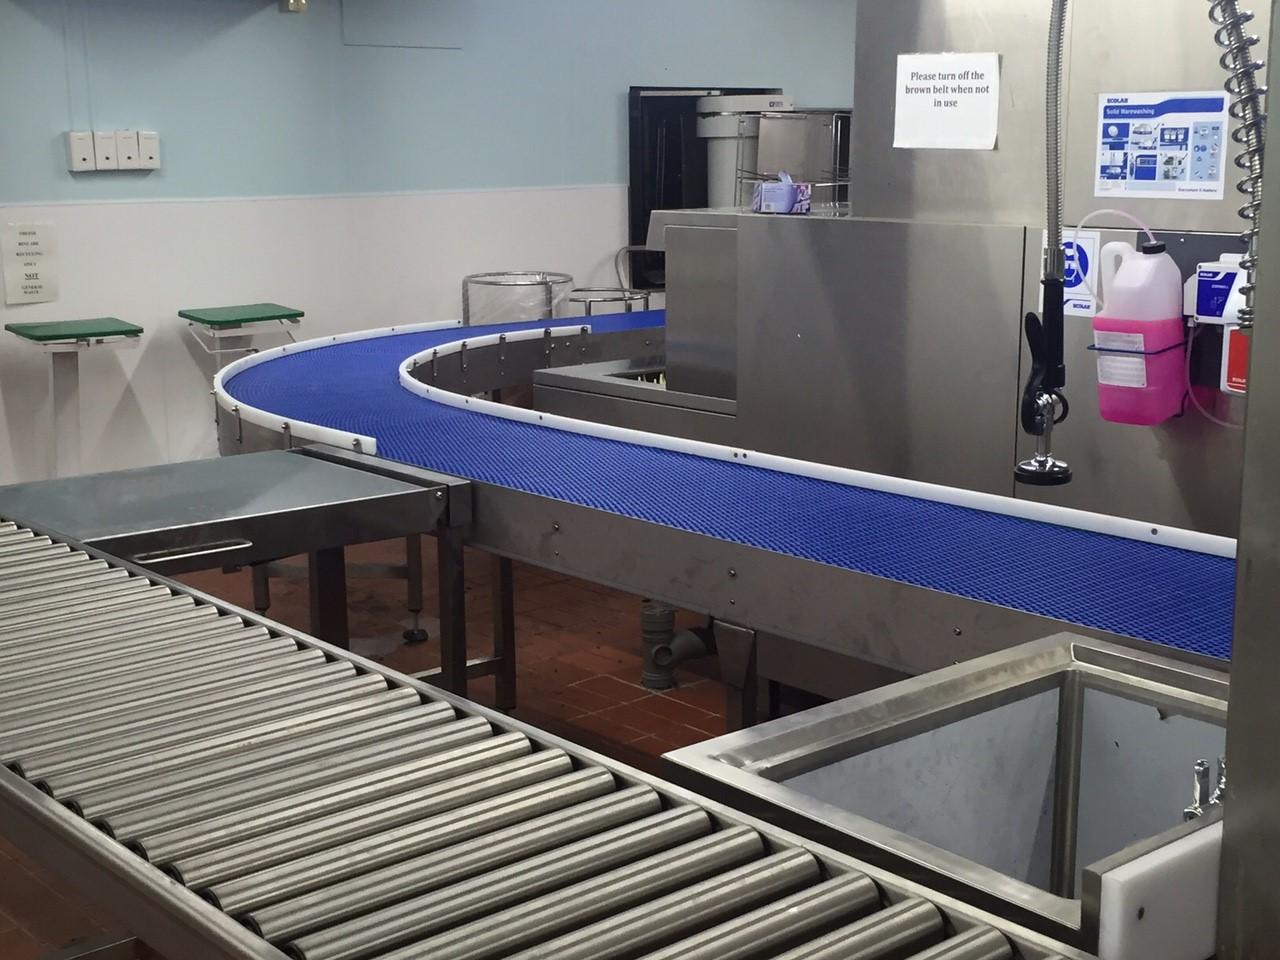 Modular belt conveyor, gravity roller conveyor, drop down tables and sink